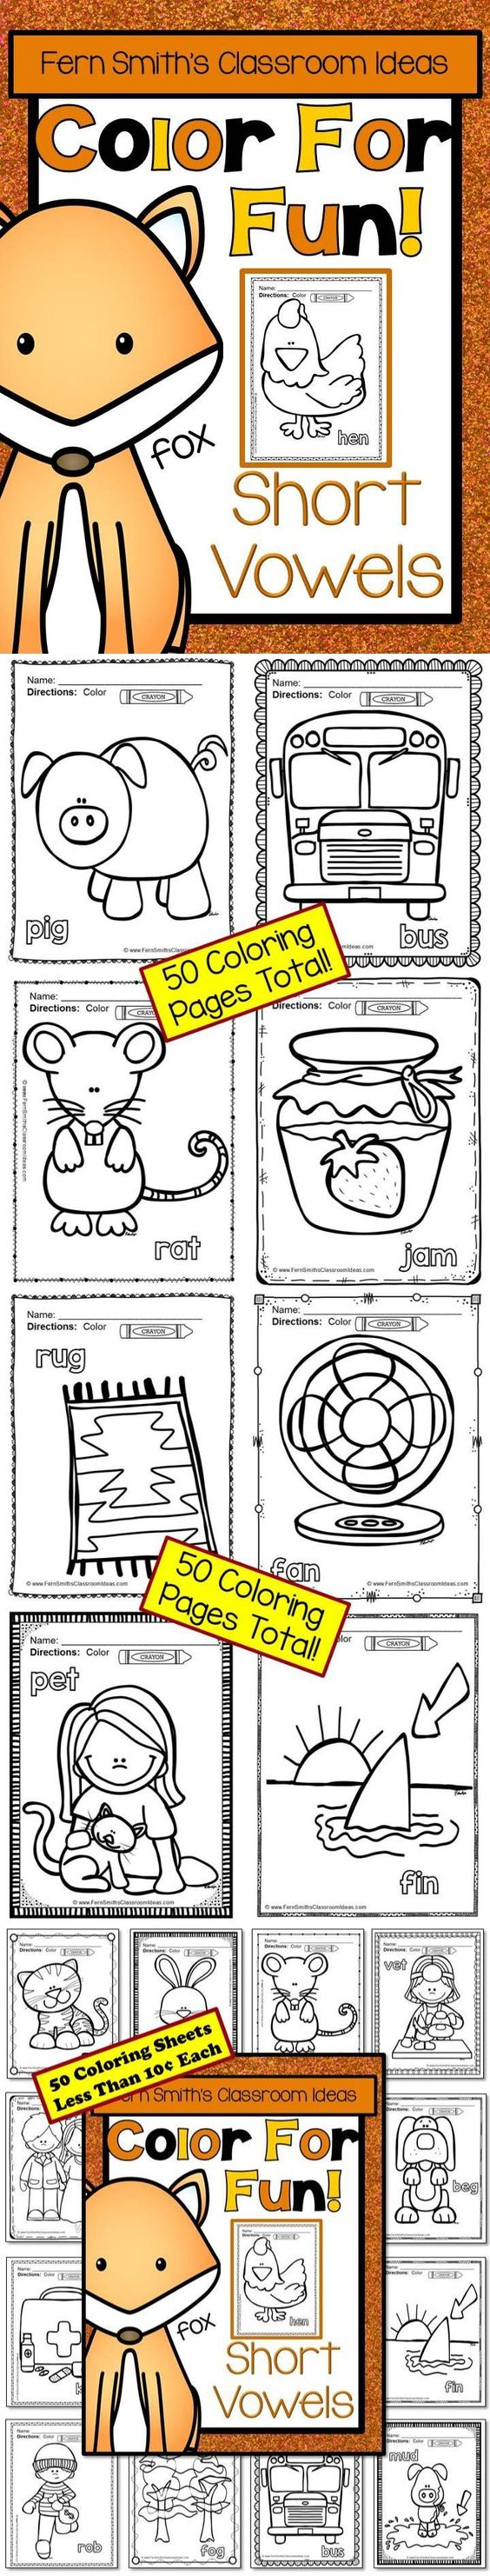 short vowels coloring pages - photo#35